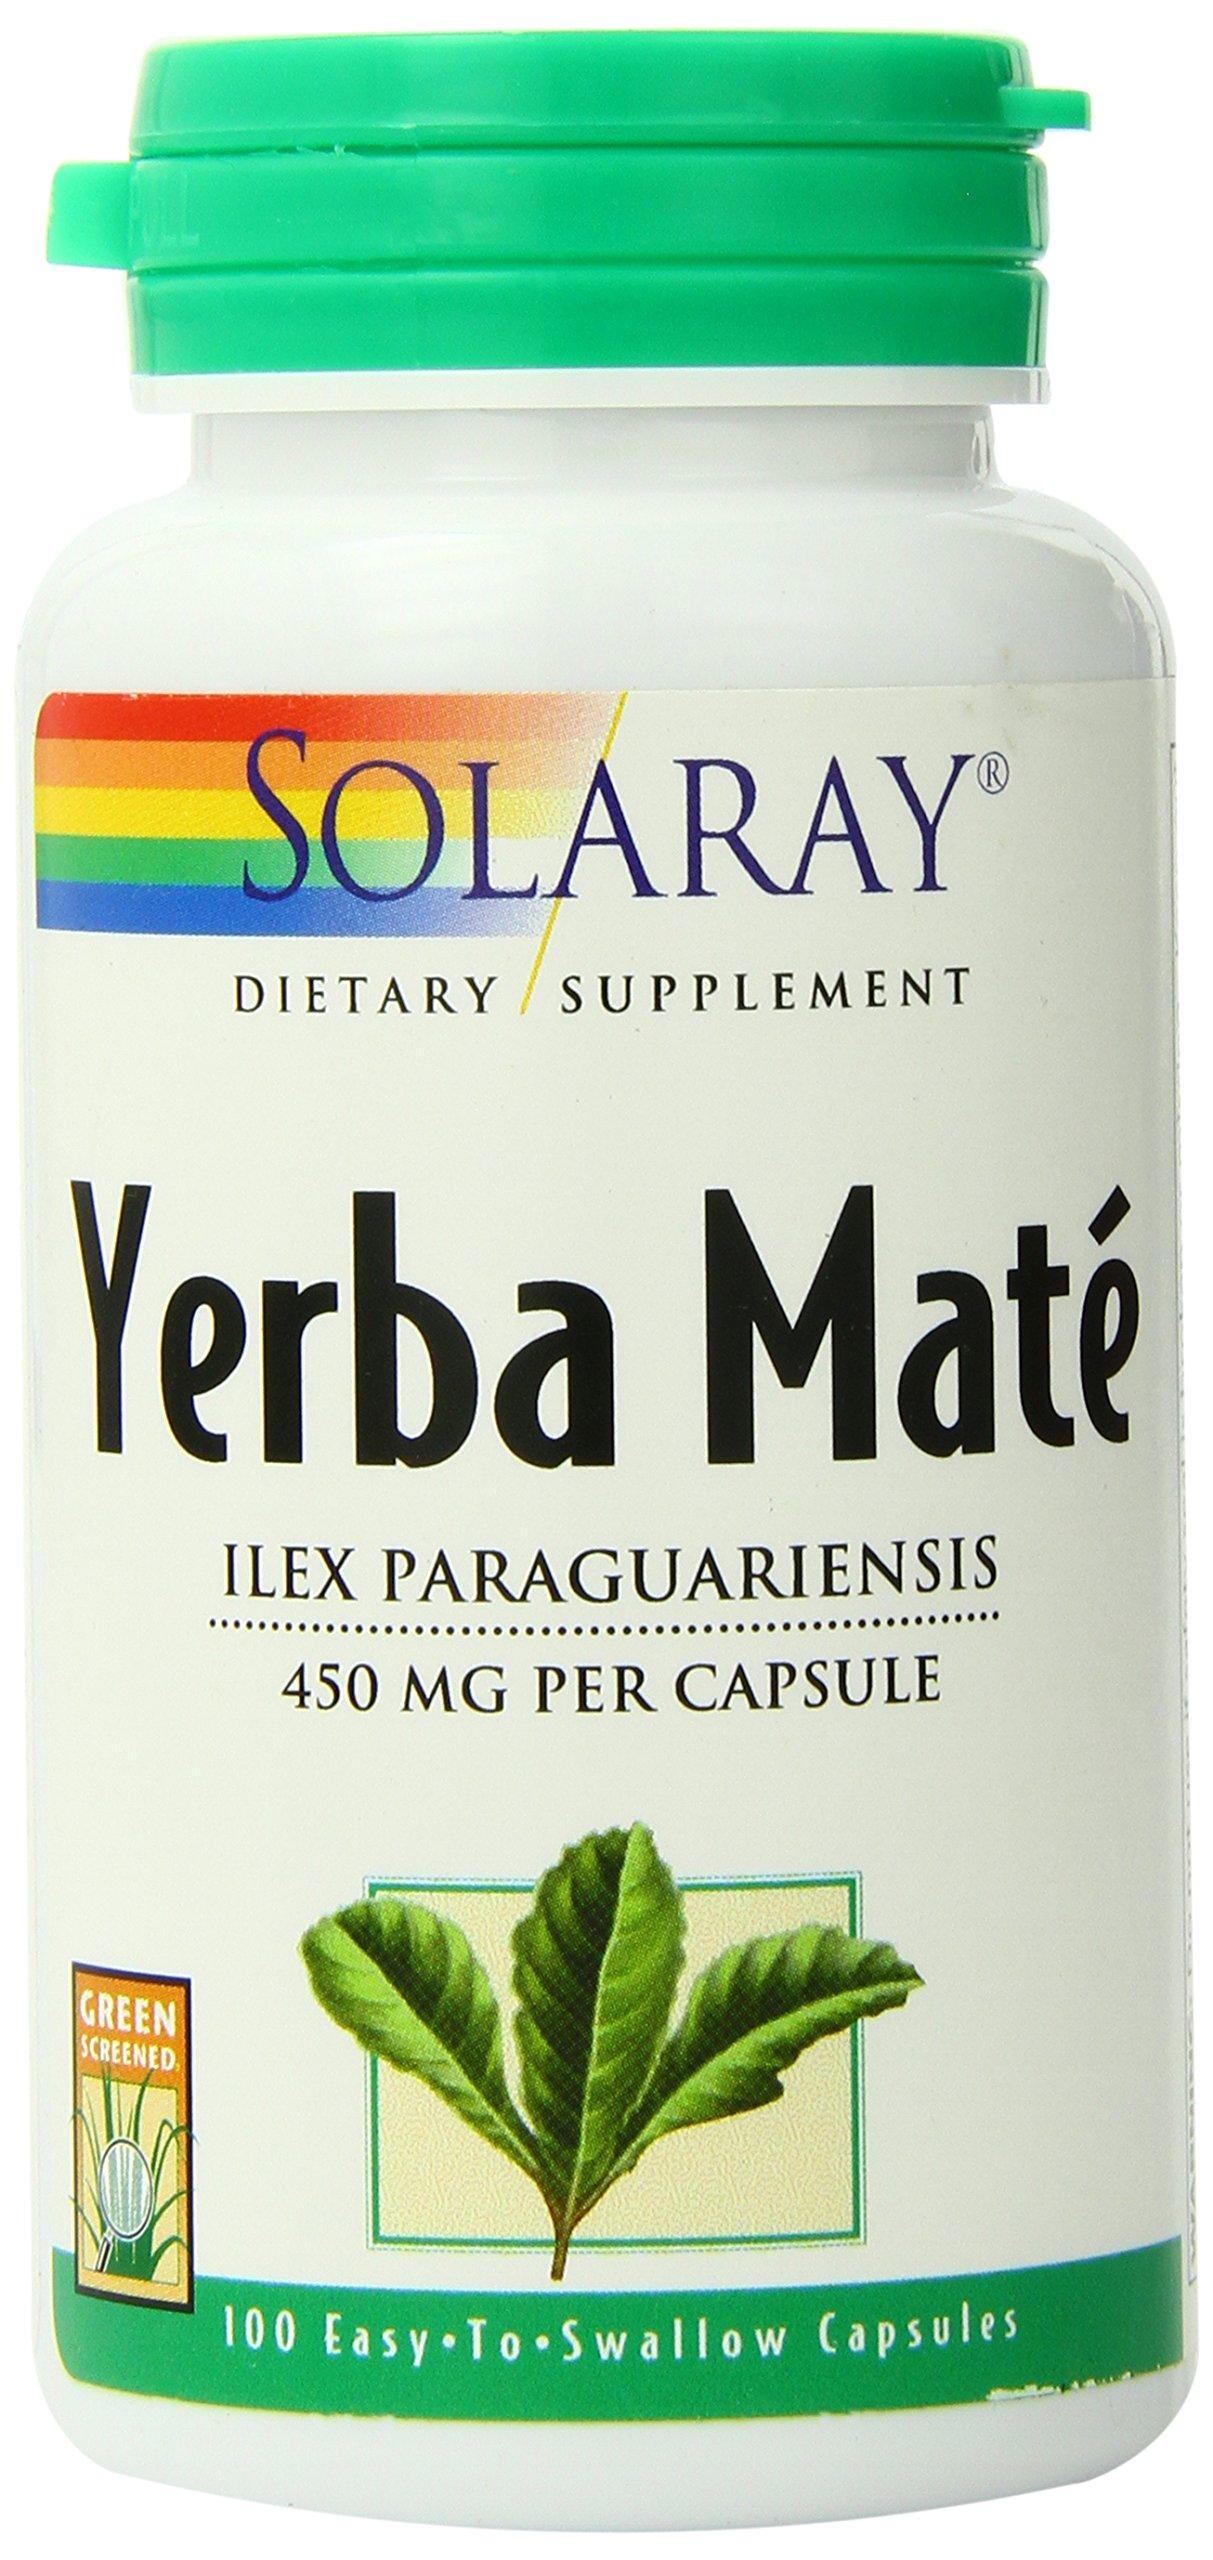 Solaray Yerba Mate Supplement, 450mg, 100 Count